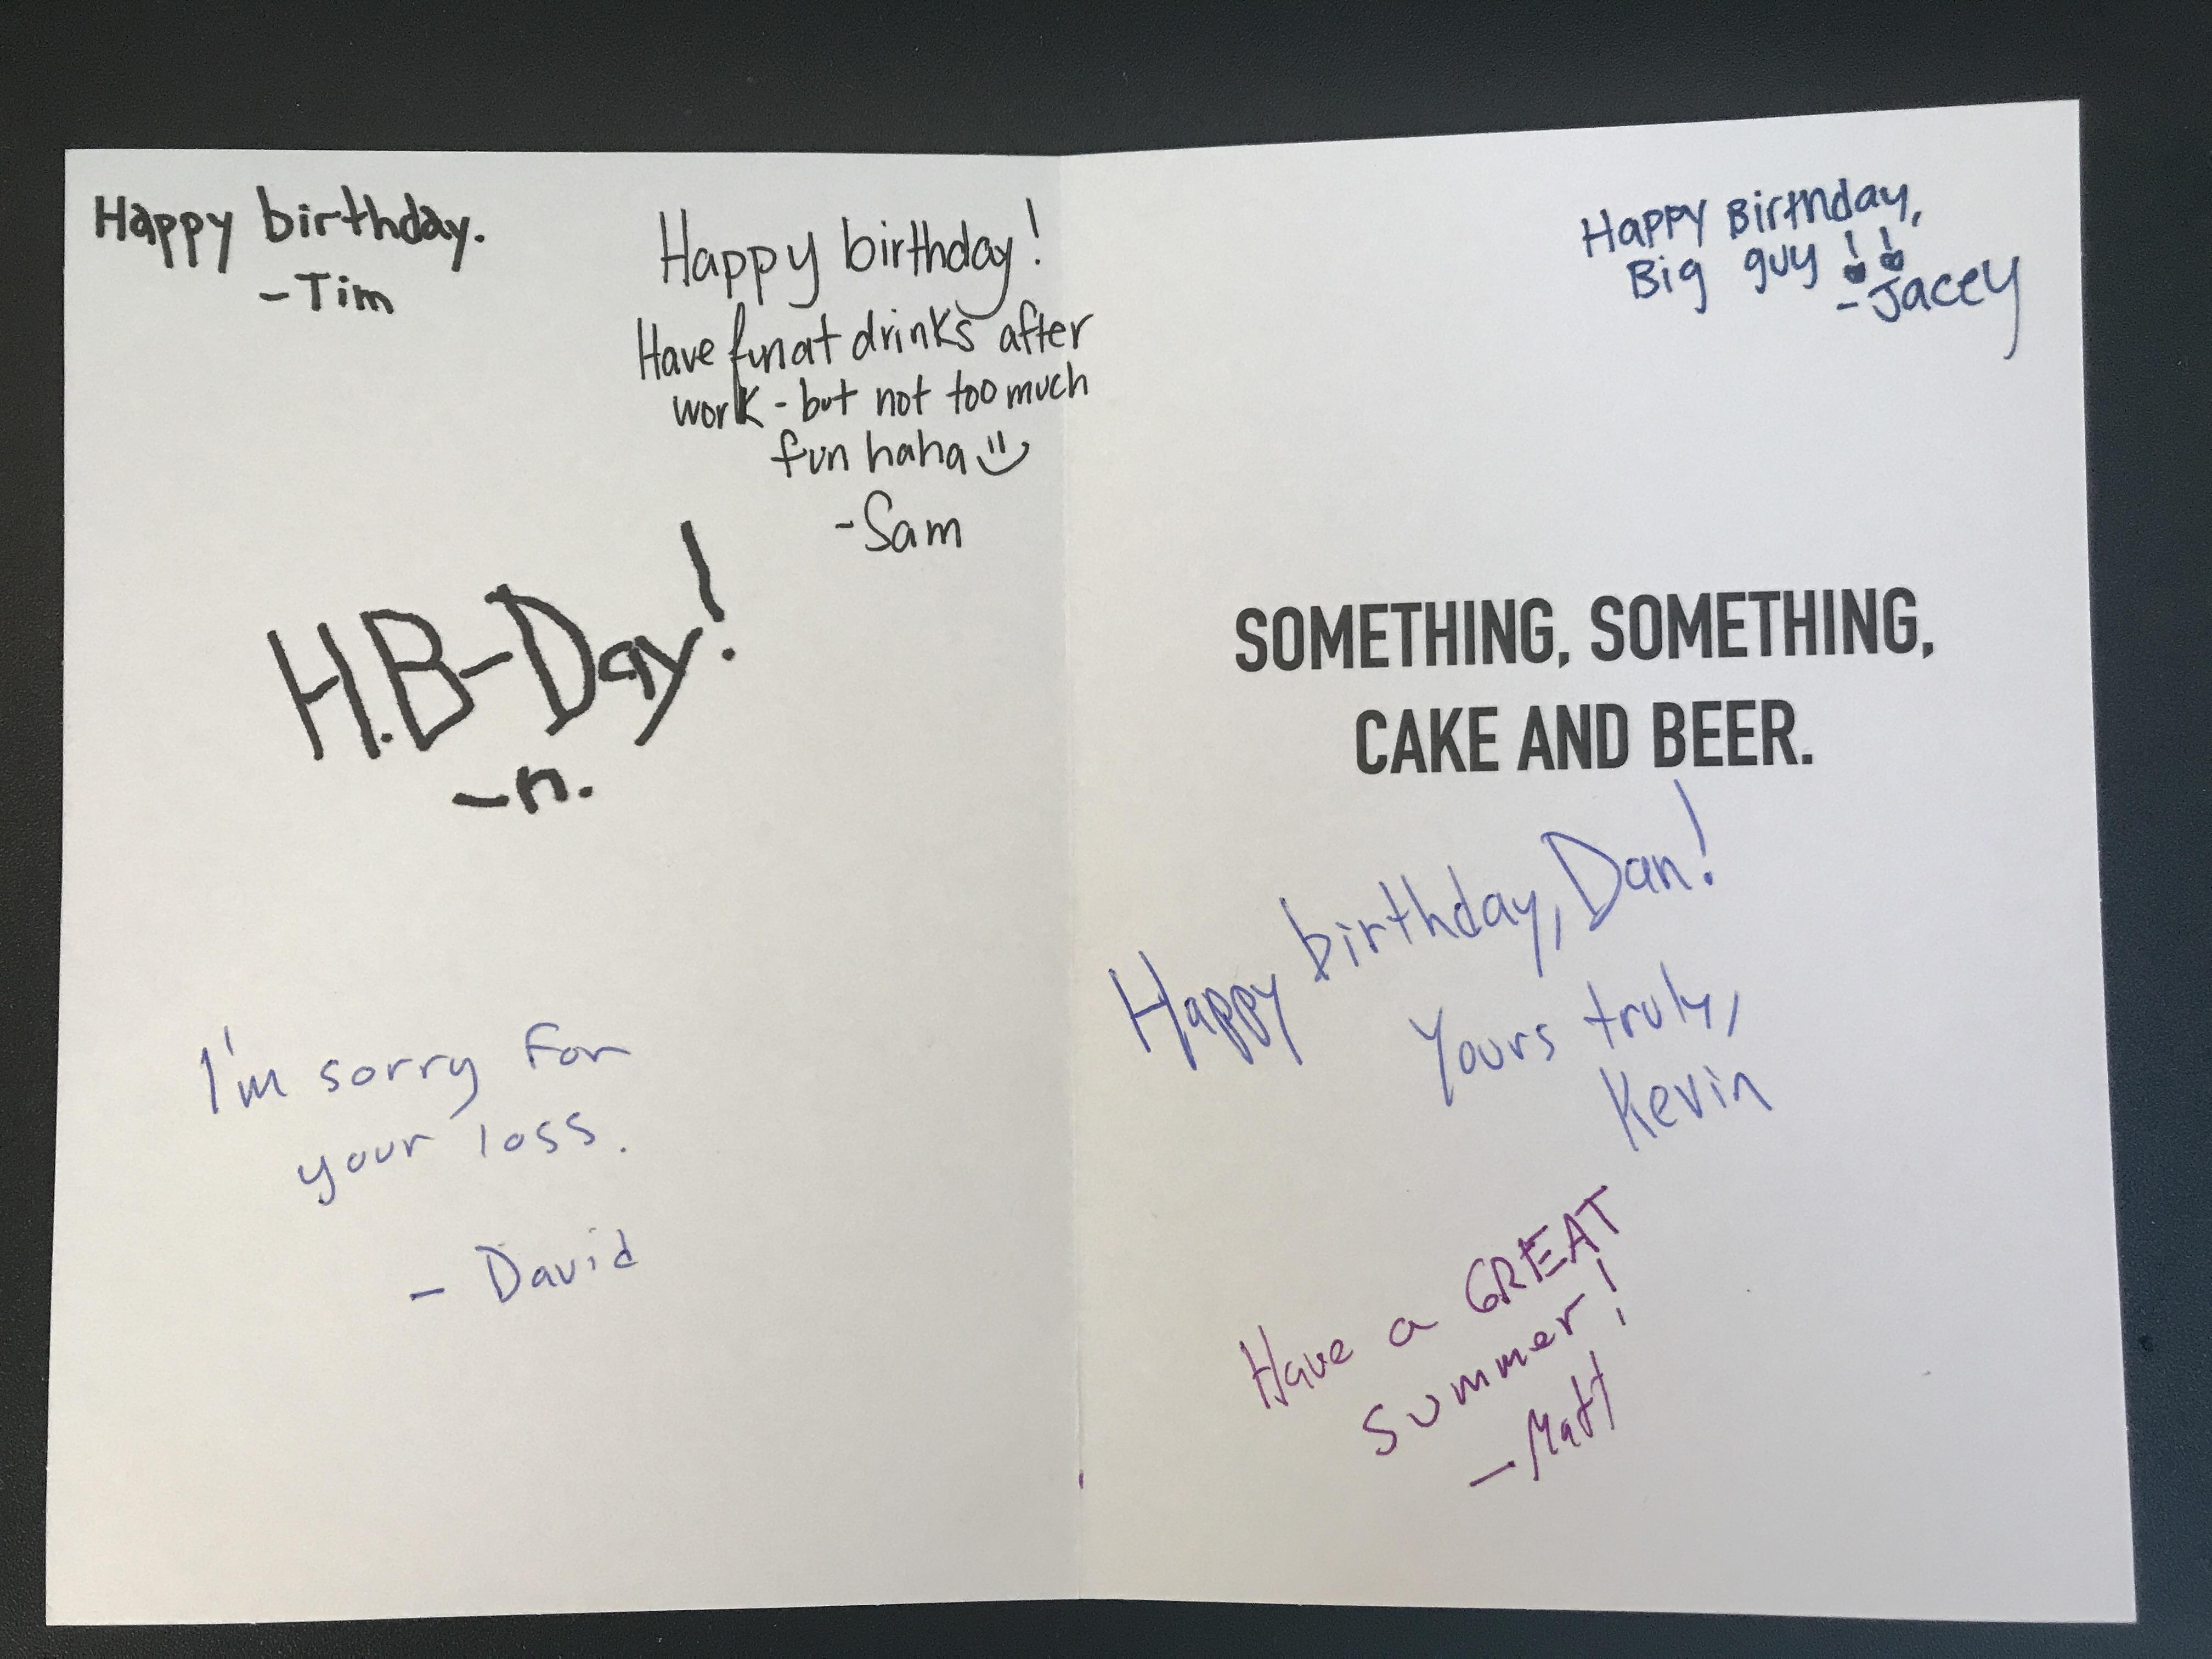 Translating The Office Birthday Card